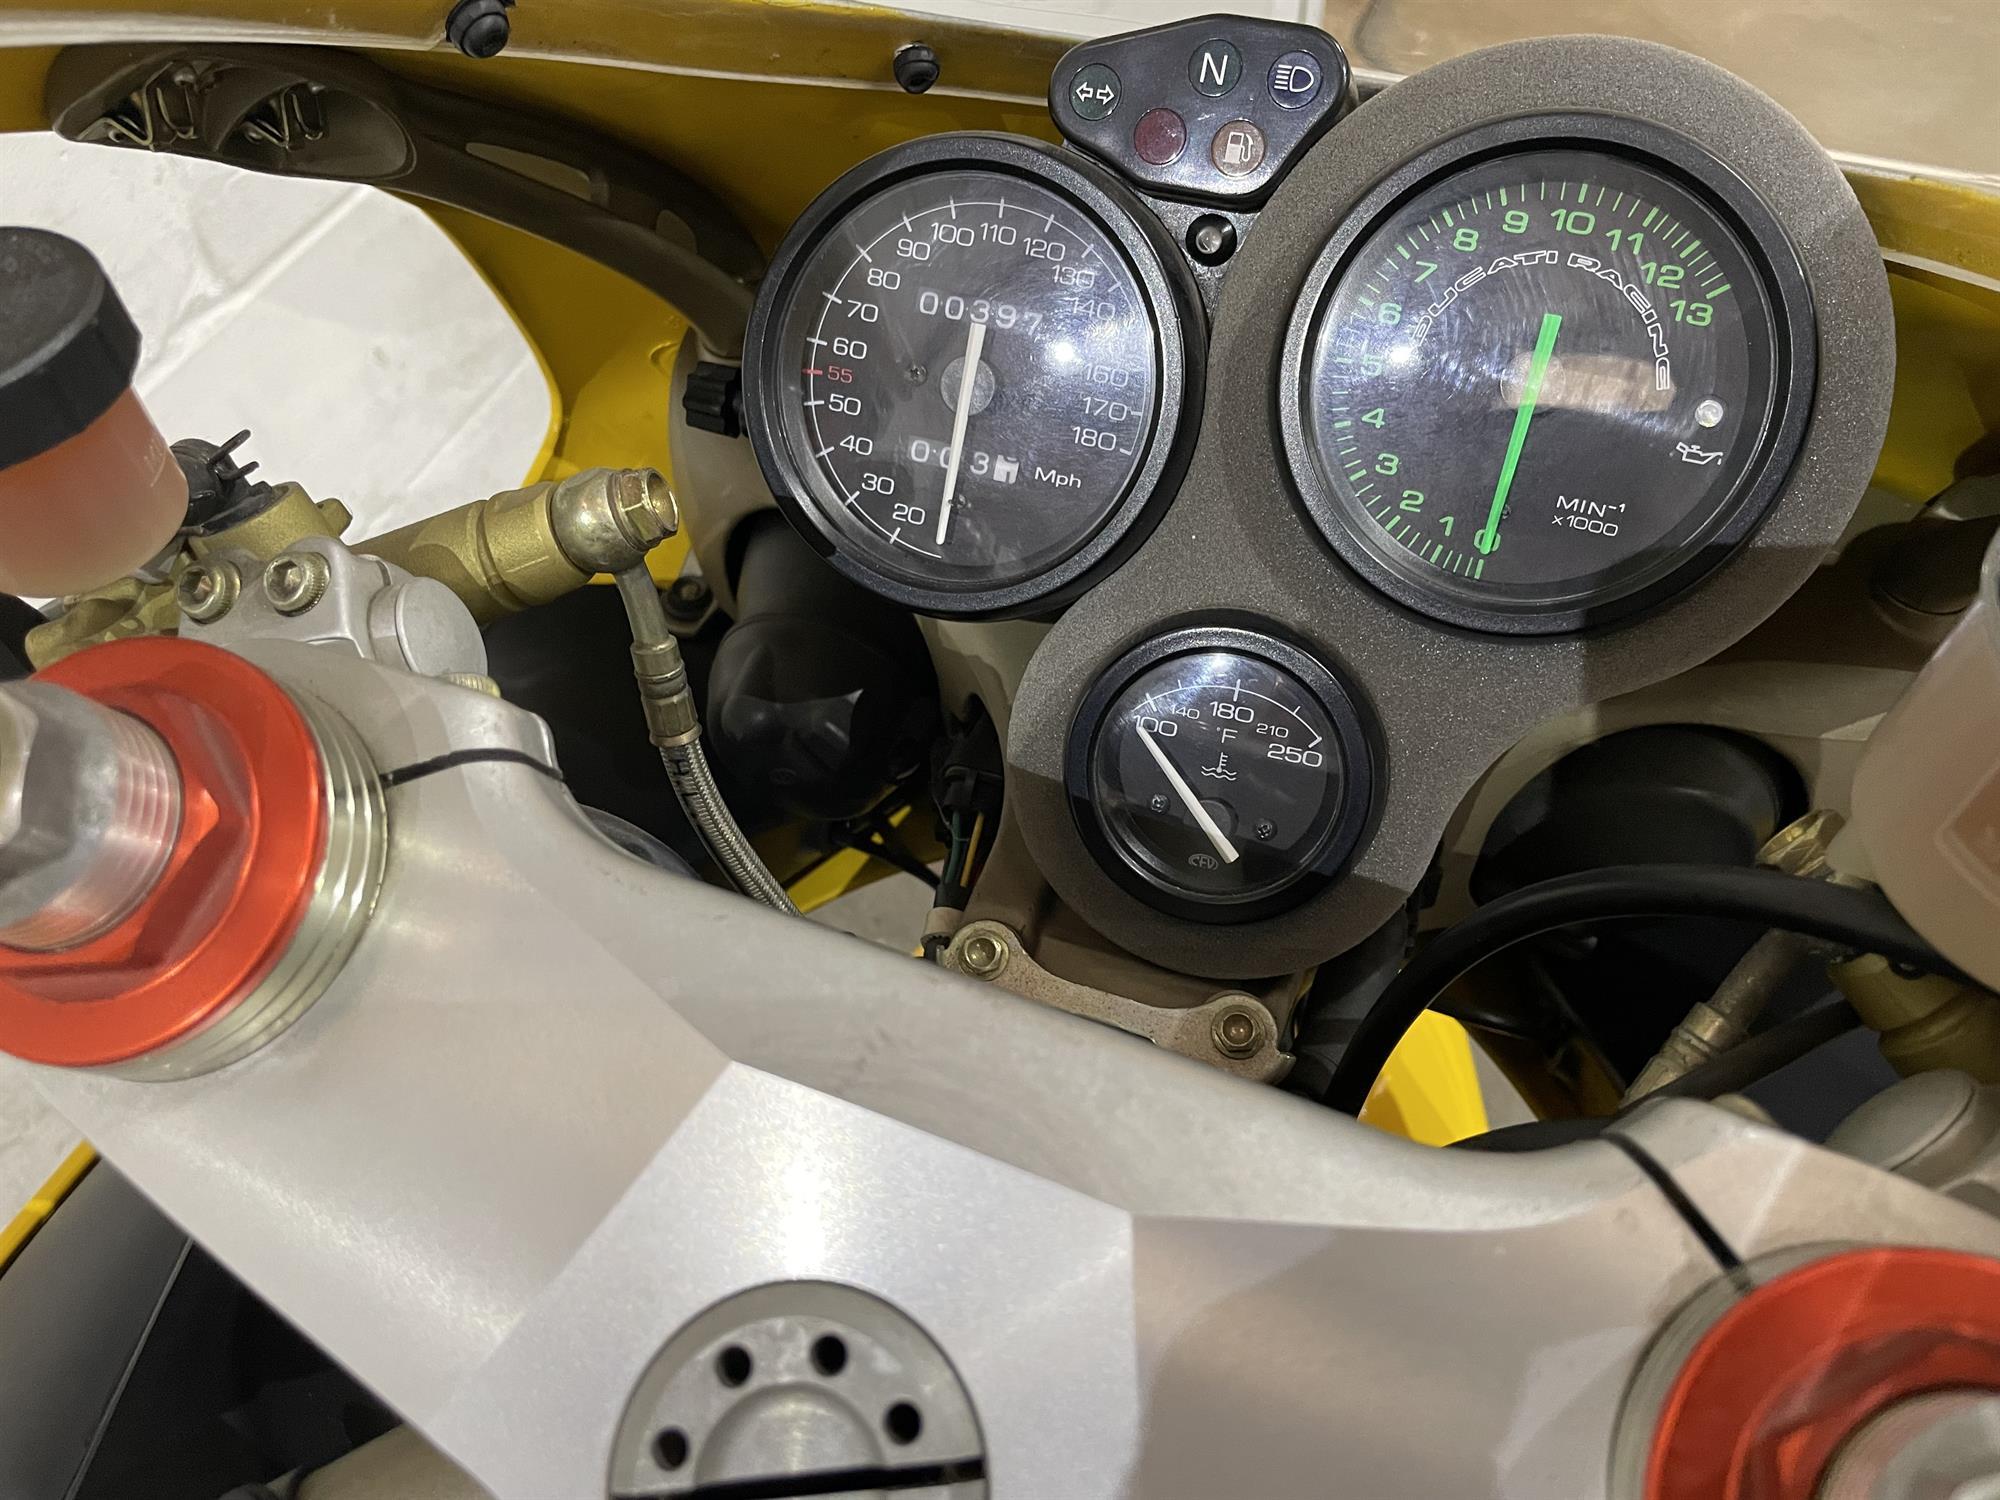 1998 Ducati 748 SPS - Image 3 of 10